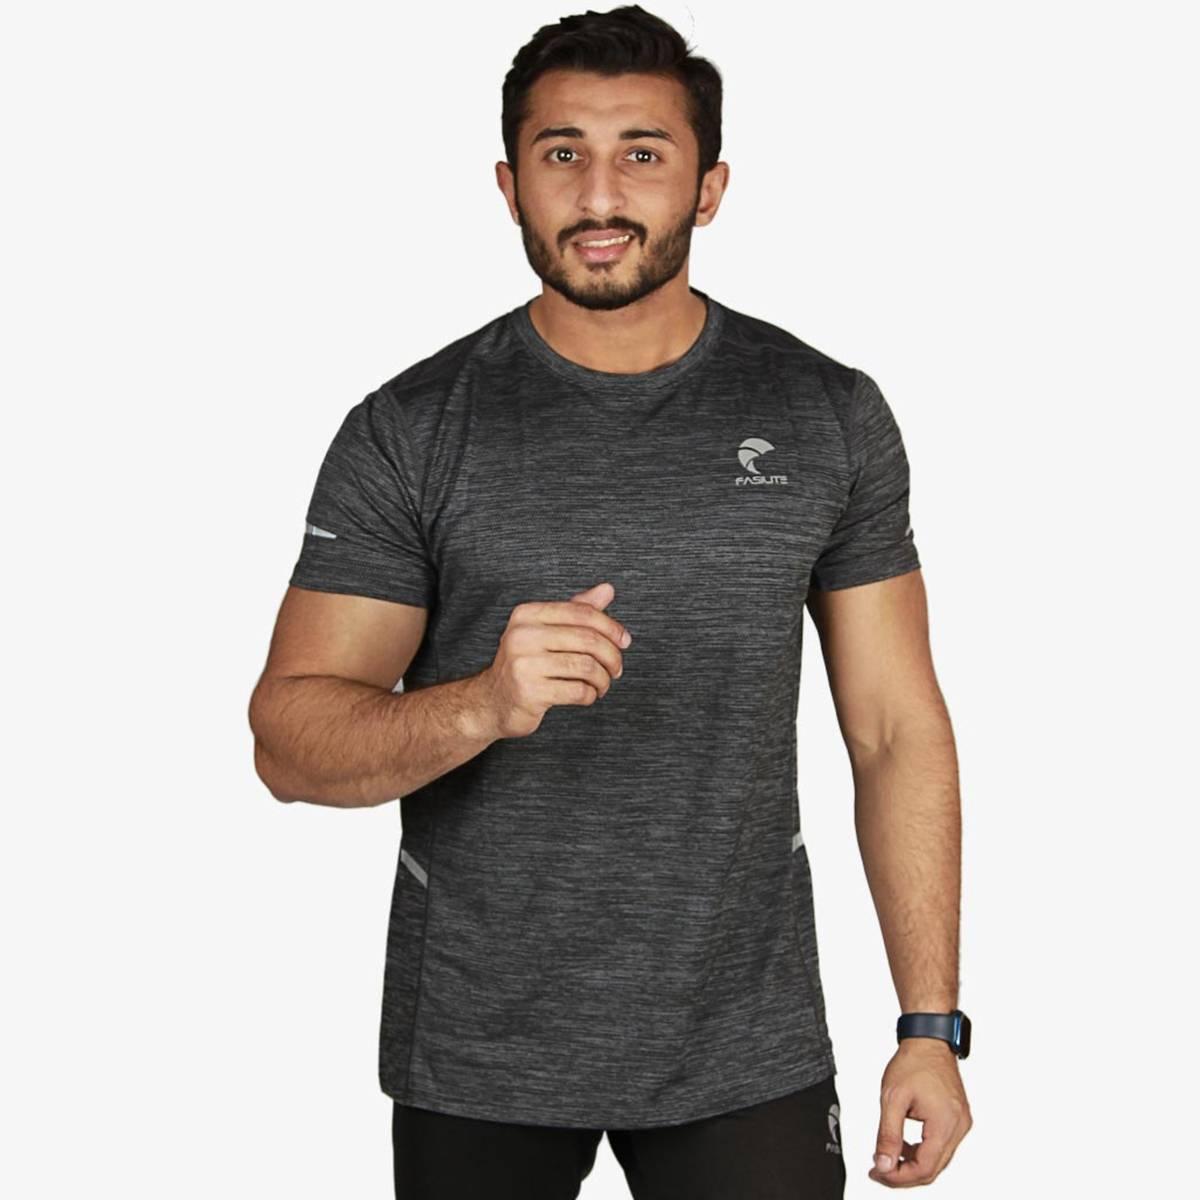 Fasilite Men Sports T-Shirt, Running T-Shirts, Quick Dry Compression Sport T-Shirts, Fitness Gym Running Shirts, Soccer Shirts, Men's Jersey Sportswear